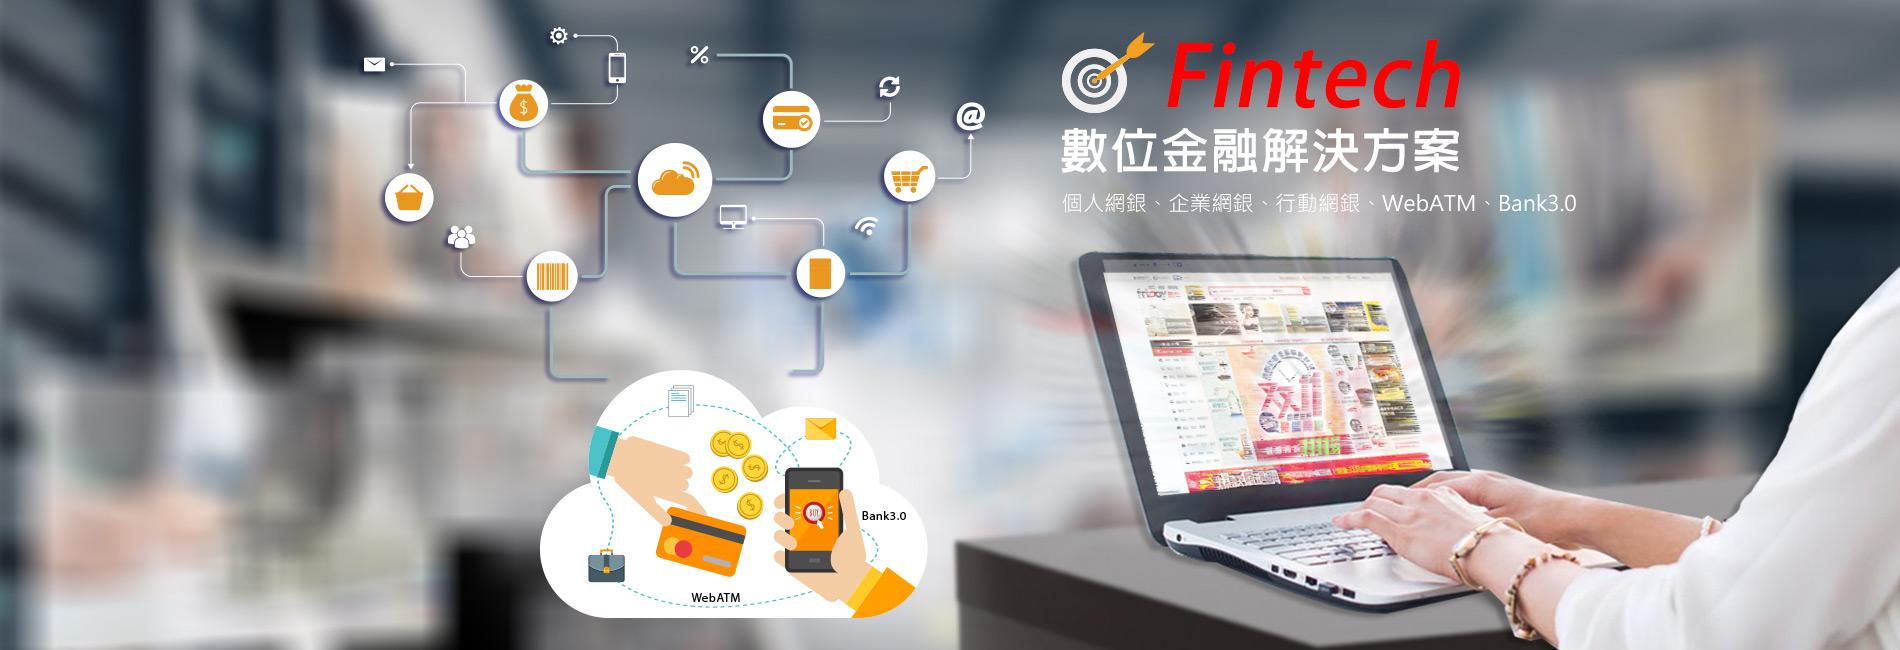 Fintech 數位金融解決方案